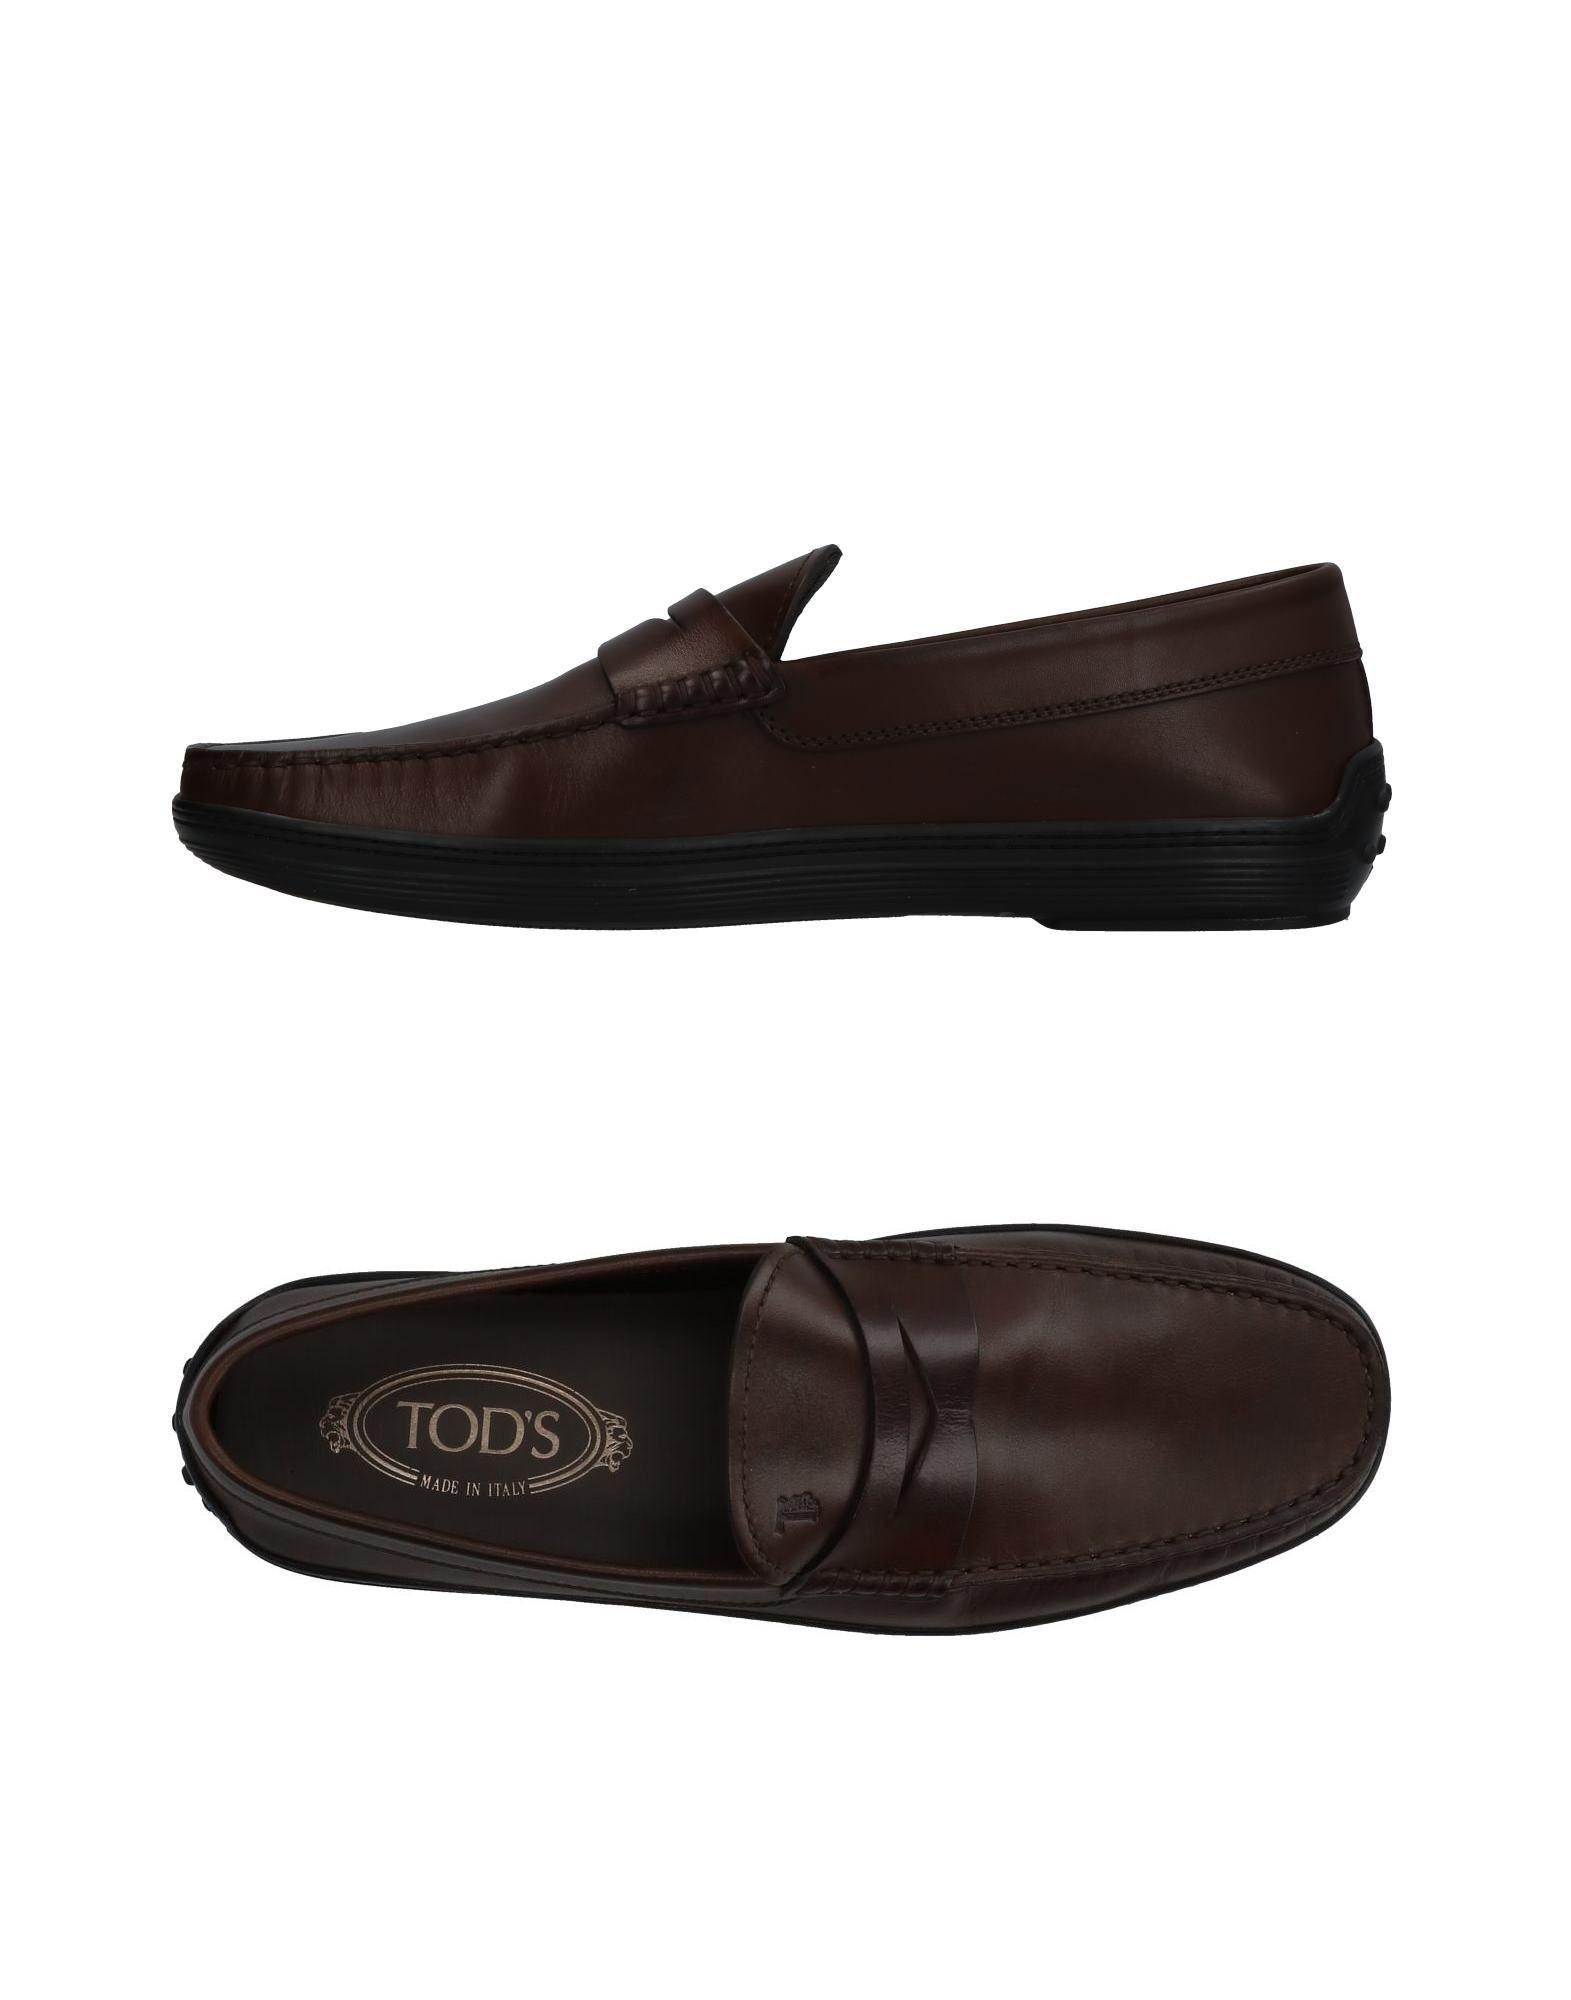 Tod's Mokassins Herren  11350517RQ Gute Qualität beliebte Schuhe